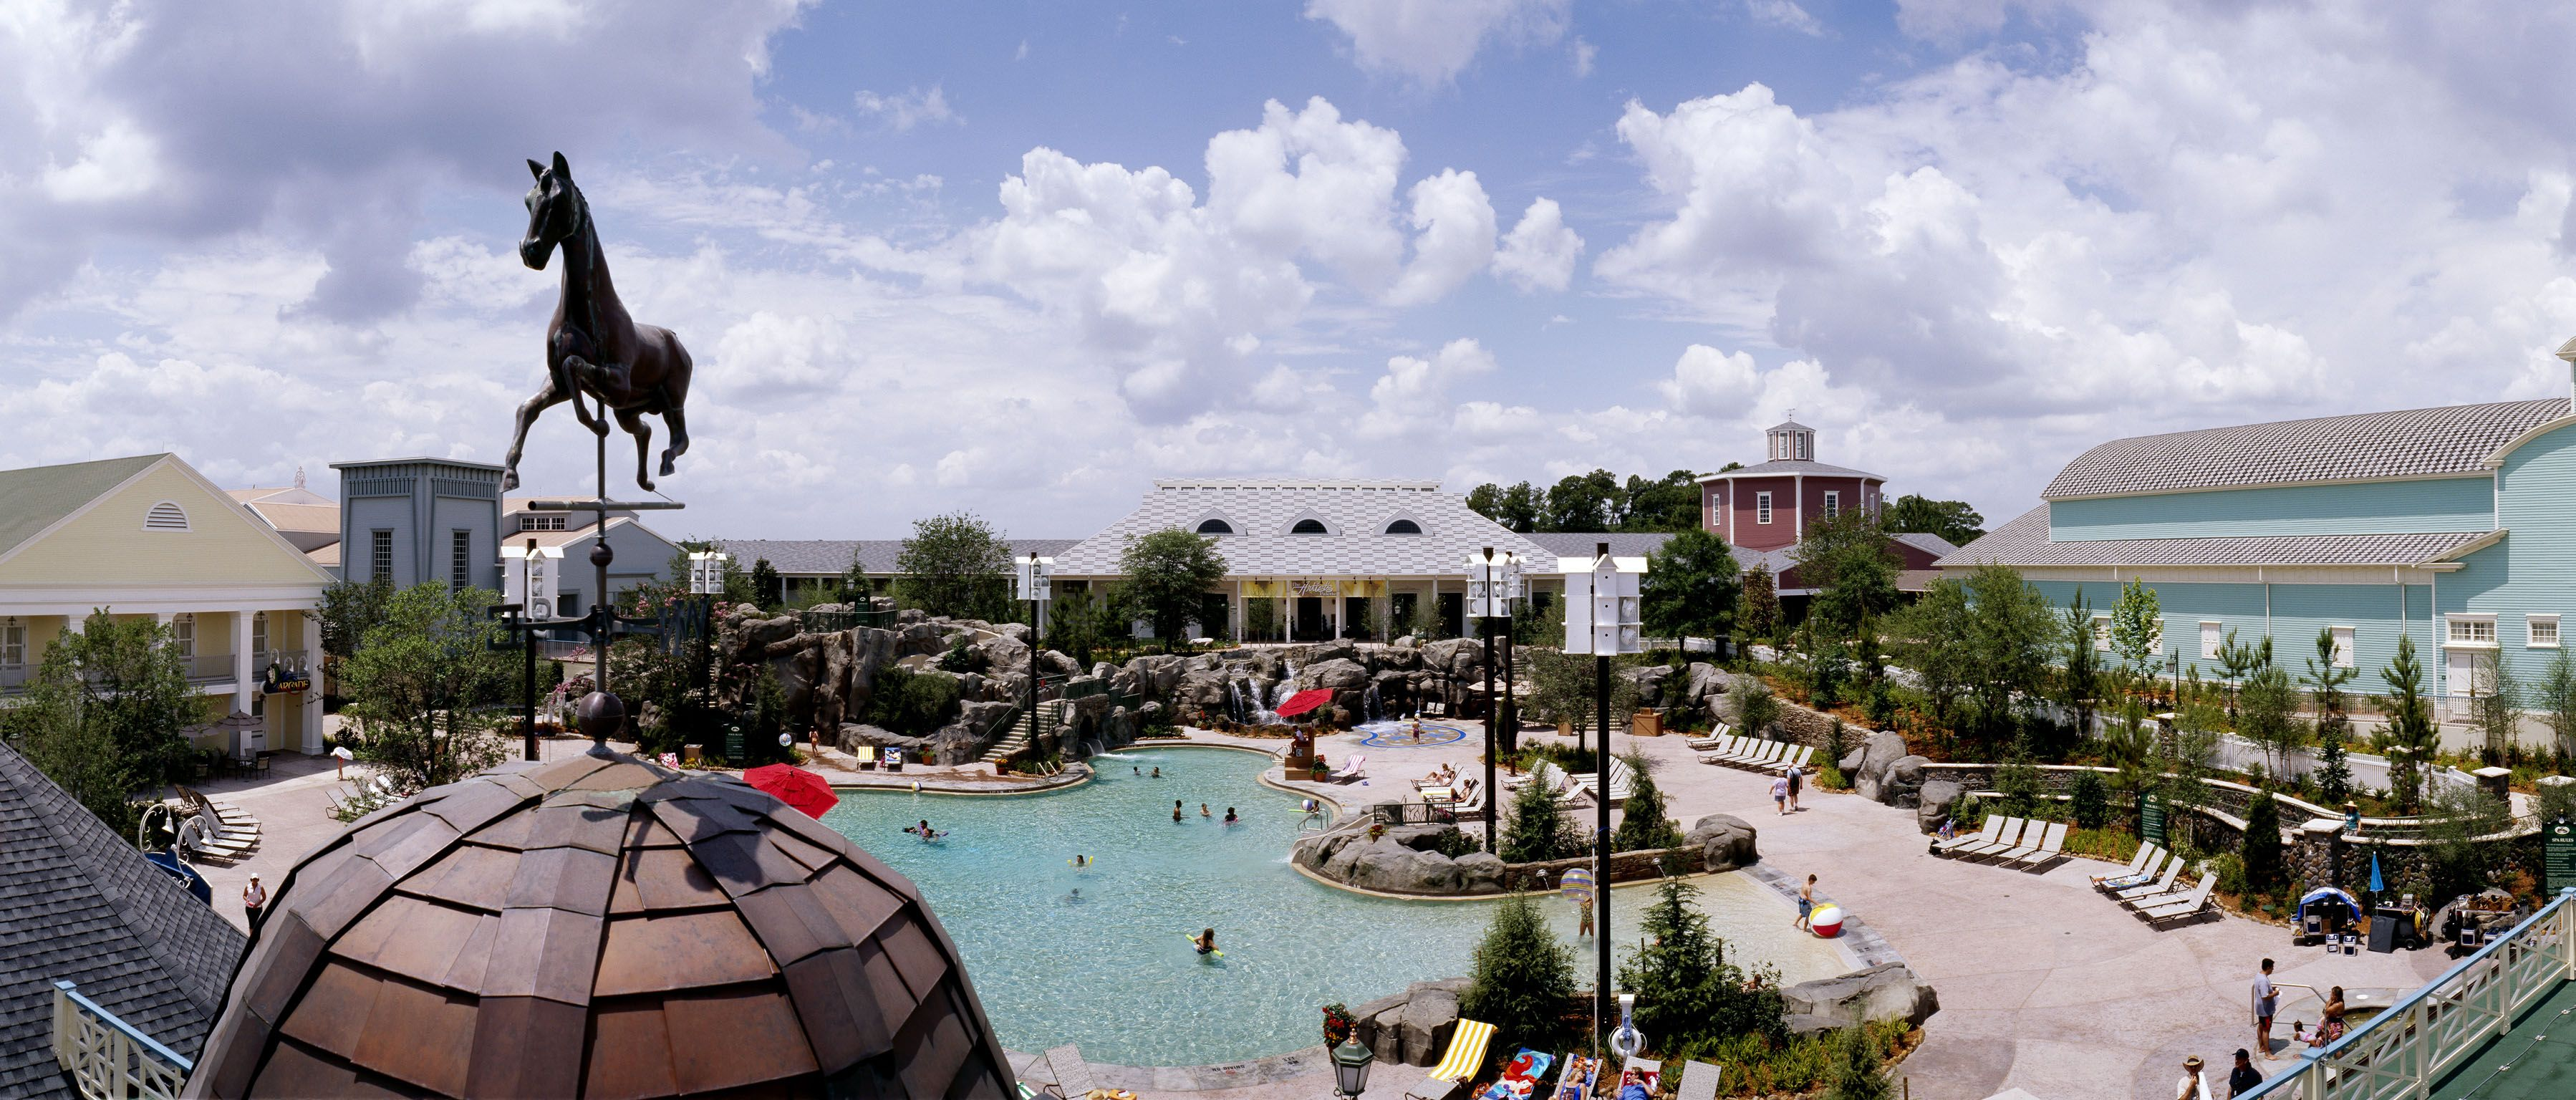 Disney Resort Hotels S Saratoga Springs Spa Walt World